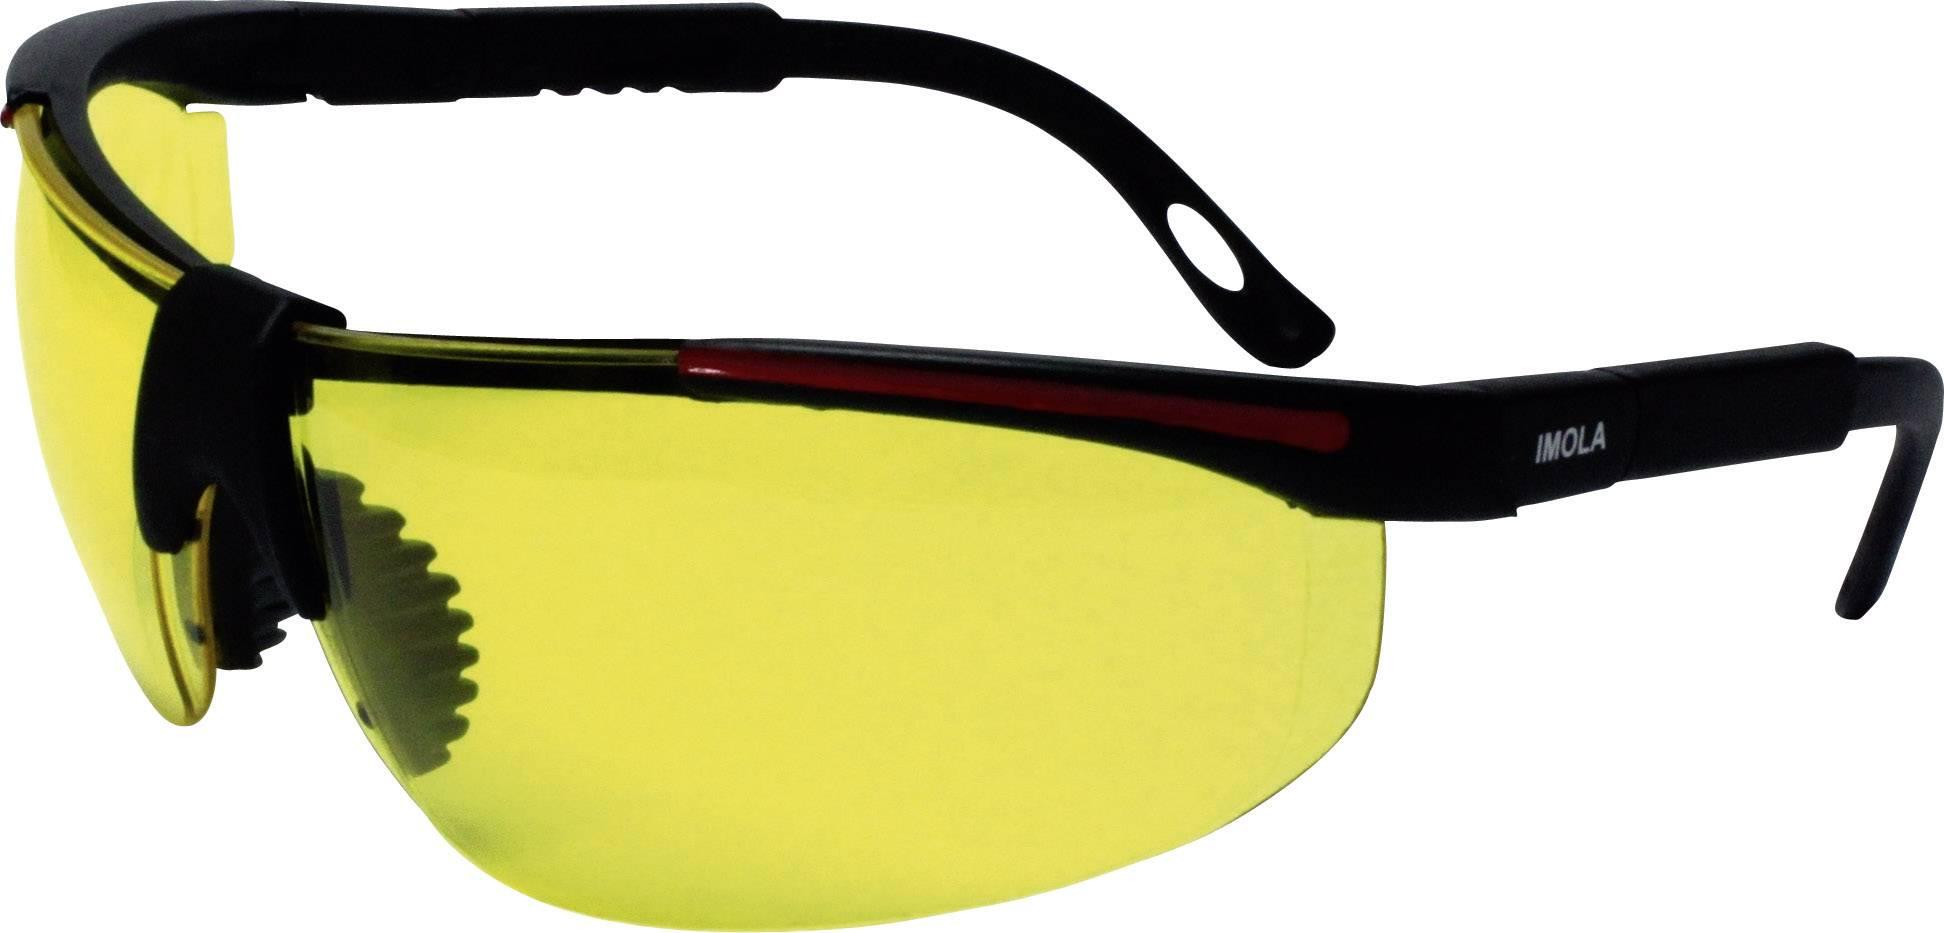 Ochranné okuliare protectionworld 2012008